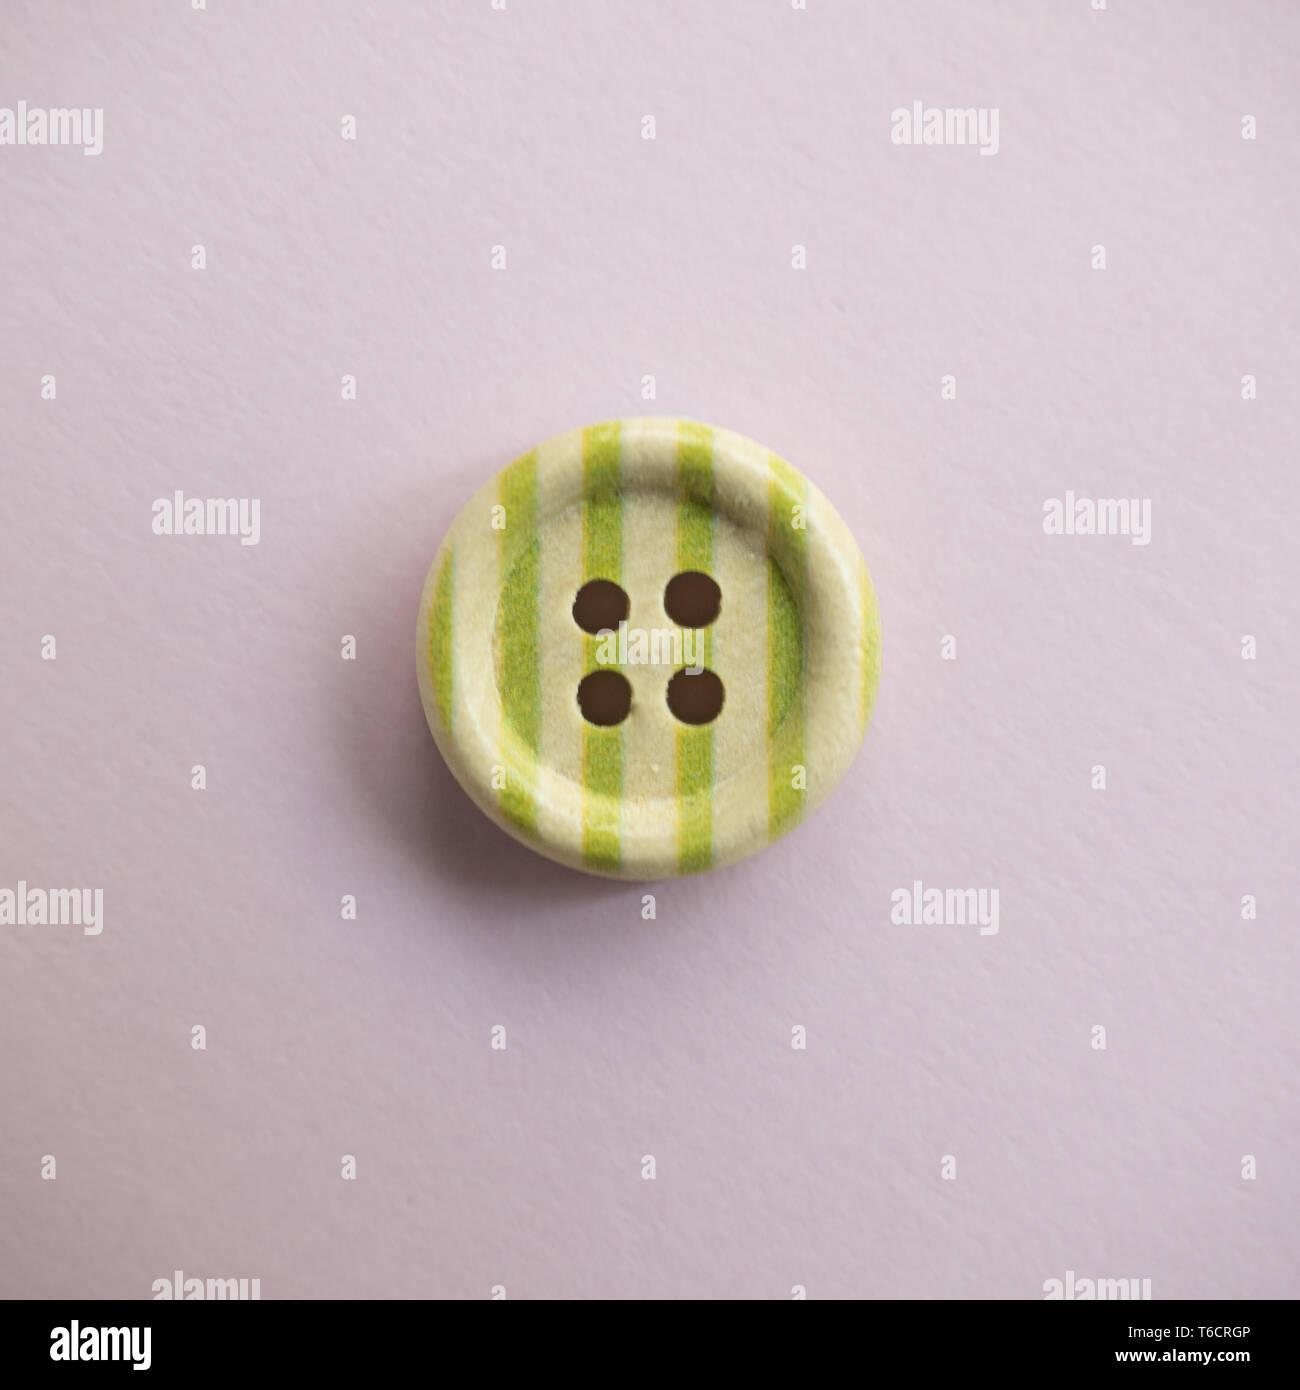 Botón de madera aislados con rayas coloridas de color sobre un fondo de color rosa claro, costura Foto de stock